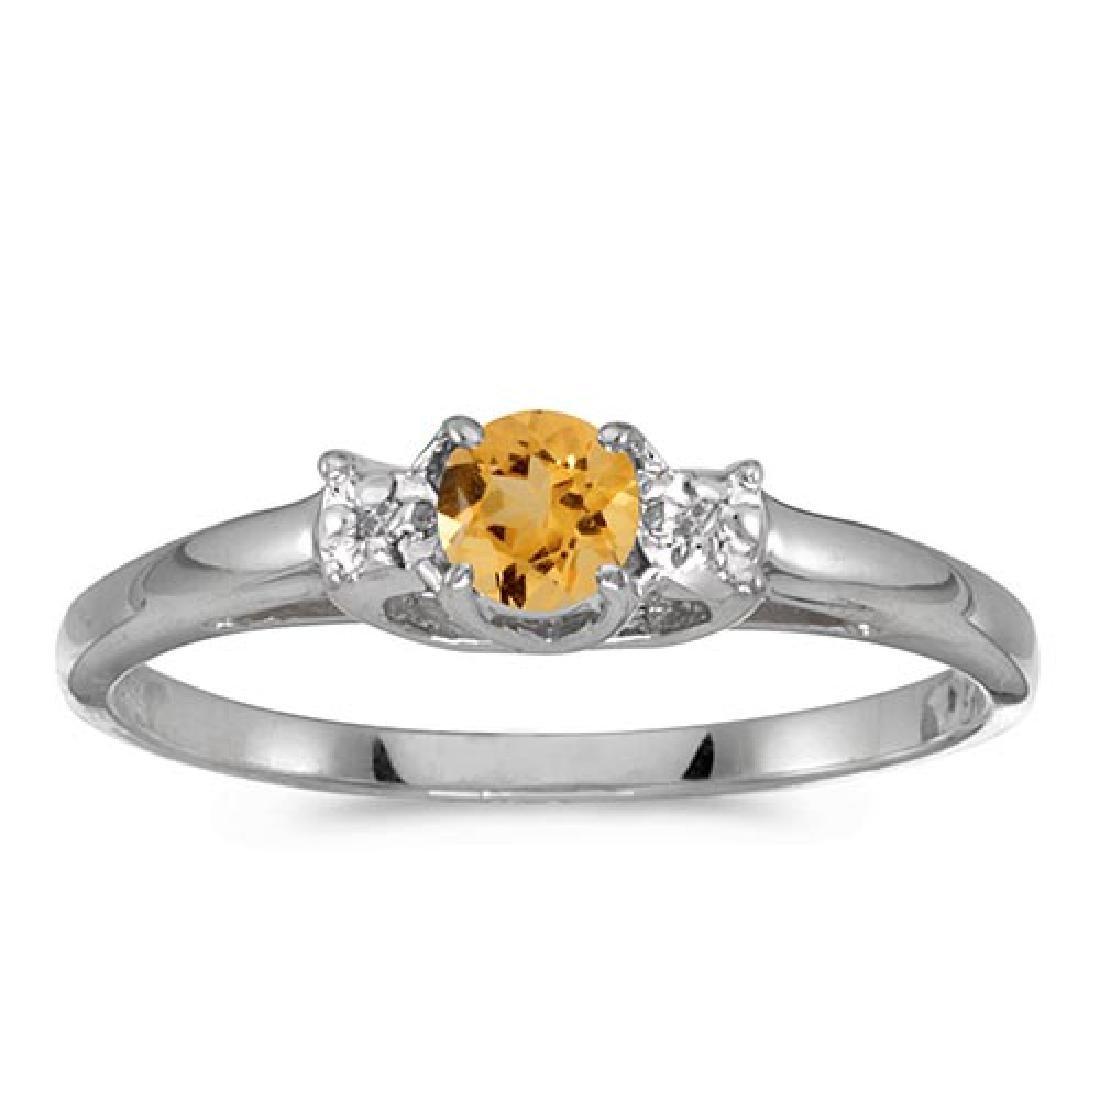 Certified 14k White Gold Round Citrine And Diamond Ring